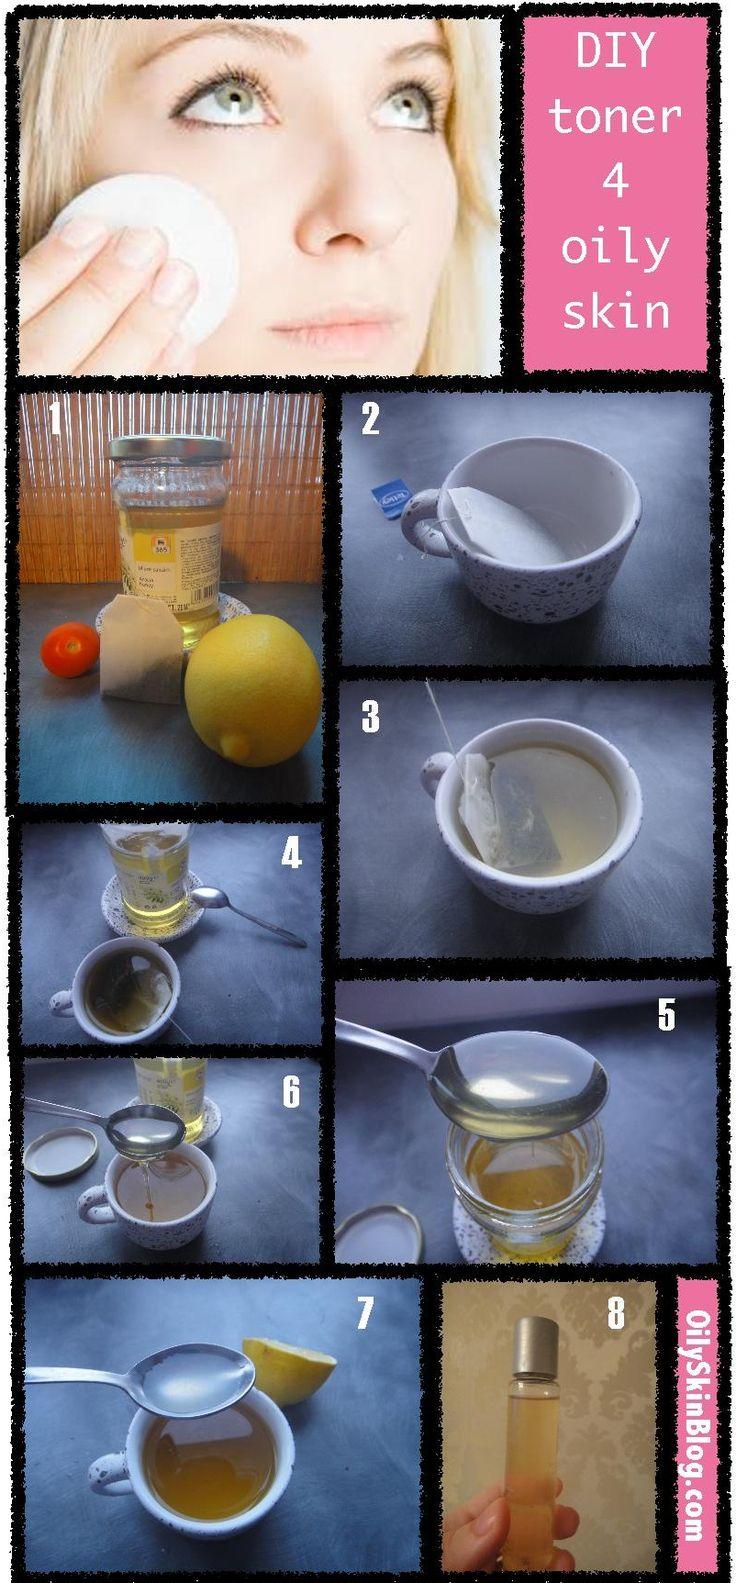 DIY  Mattifyng Toner For Oily Skin: honey green tea/chamomile tea lemon juice/tomato juice and water